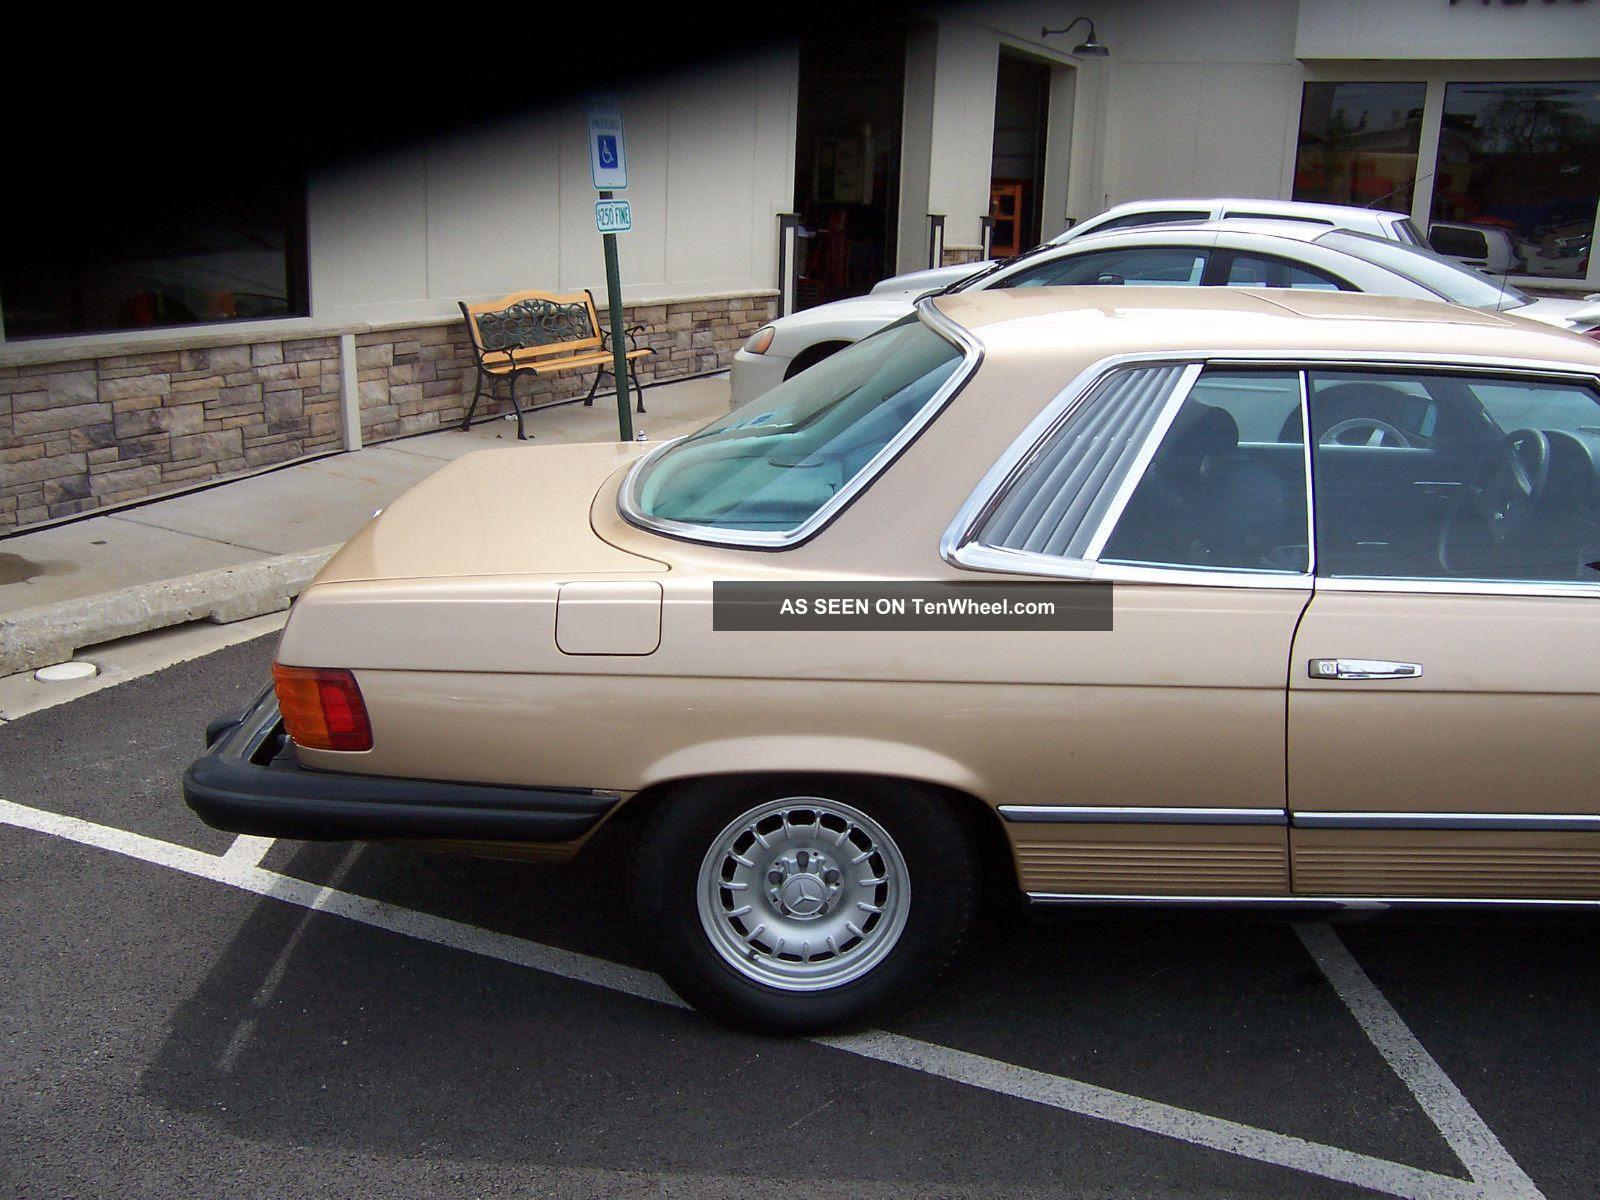 1980 Mercedes Benz Slc 450 1981 1982 1983 80 81 82